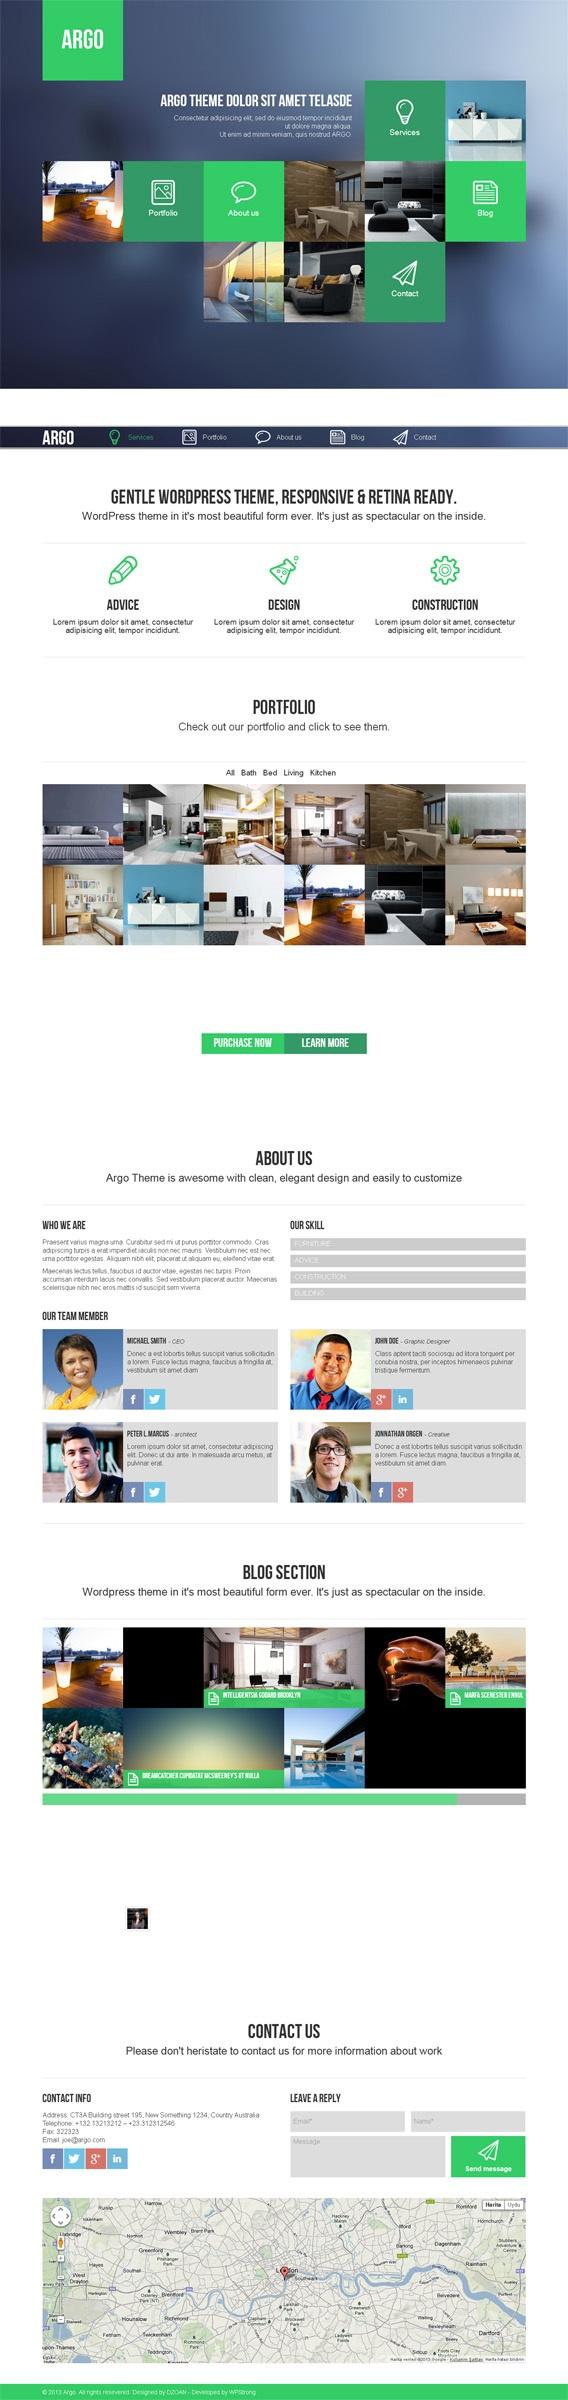 Argo, WordPress OnePage Metro UI Creative Theme by Premium Themes, via Behance